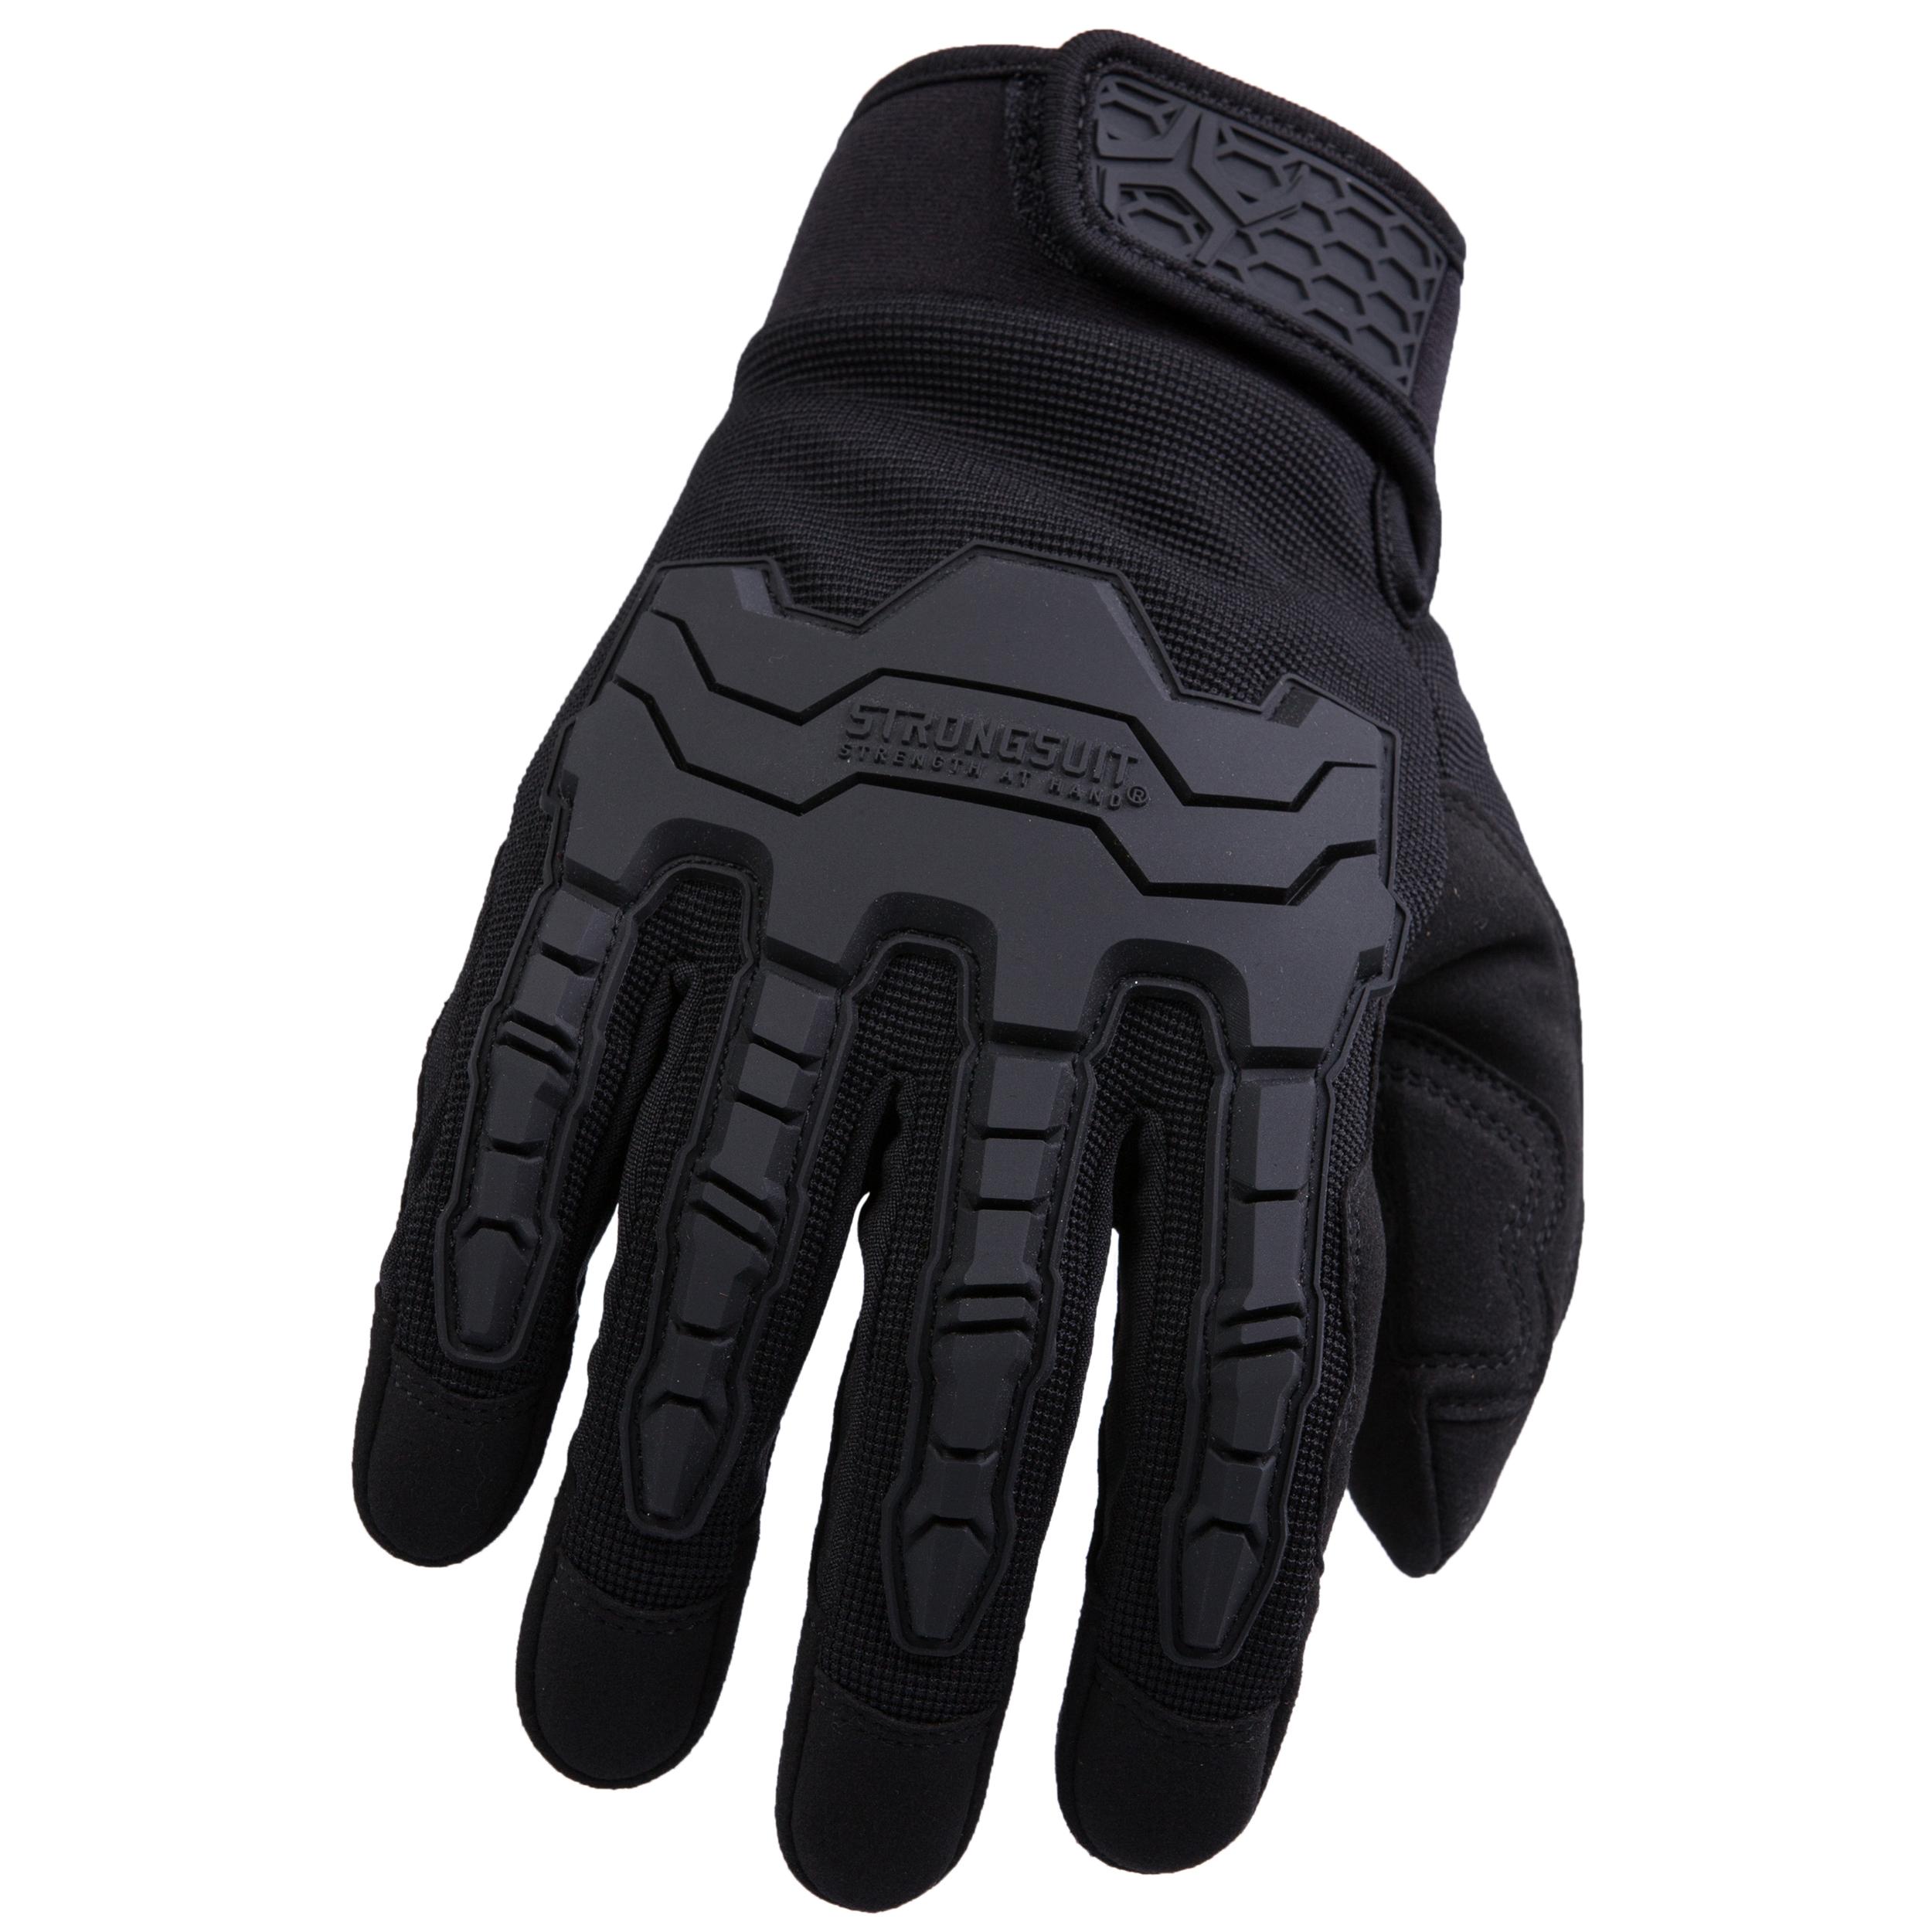 Brawny Plus Gloves, Black, Small